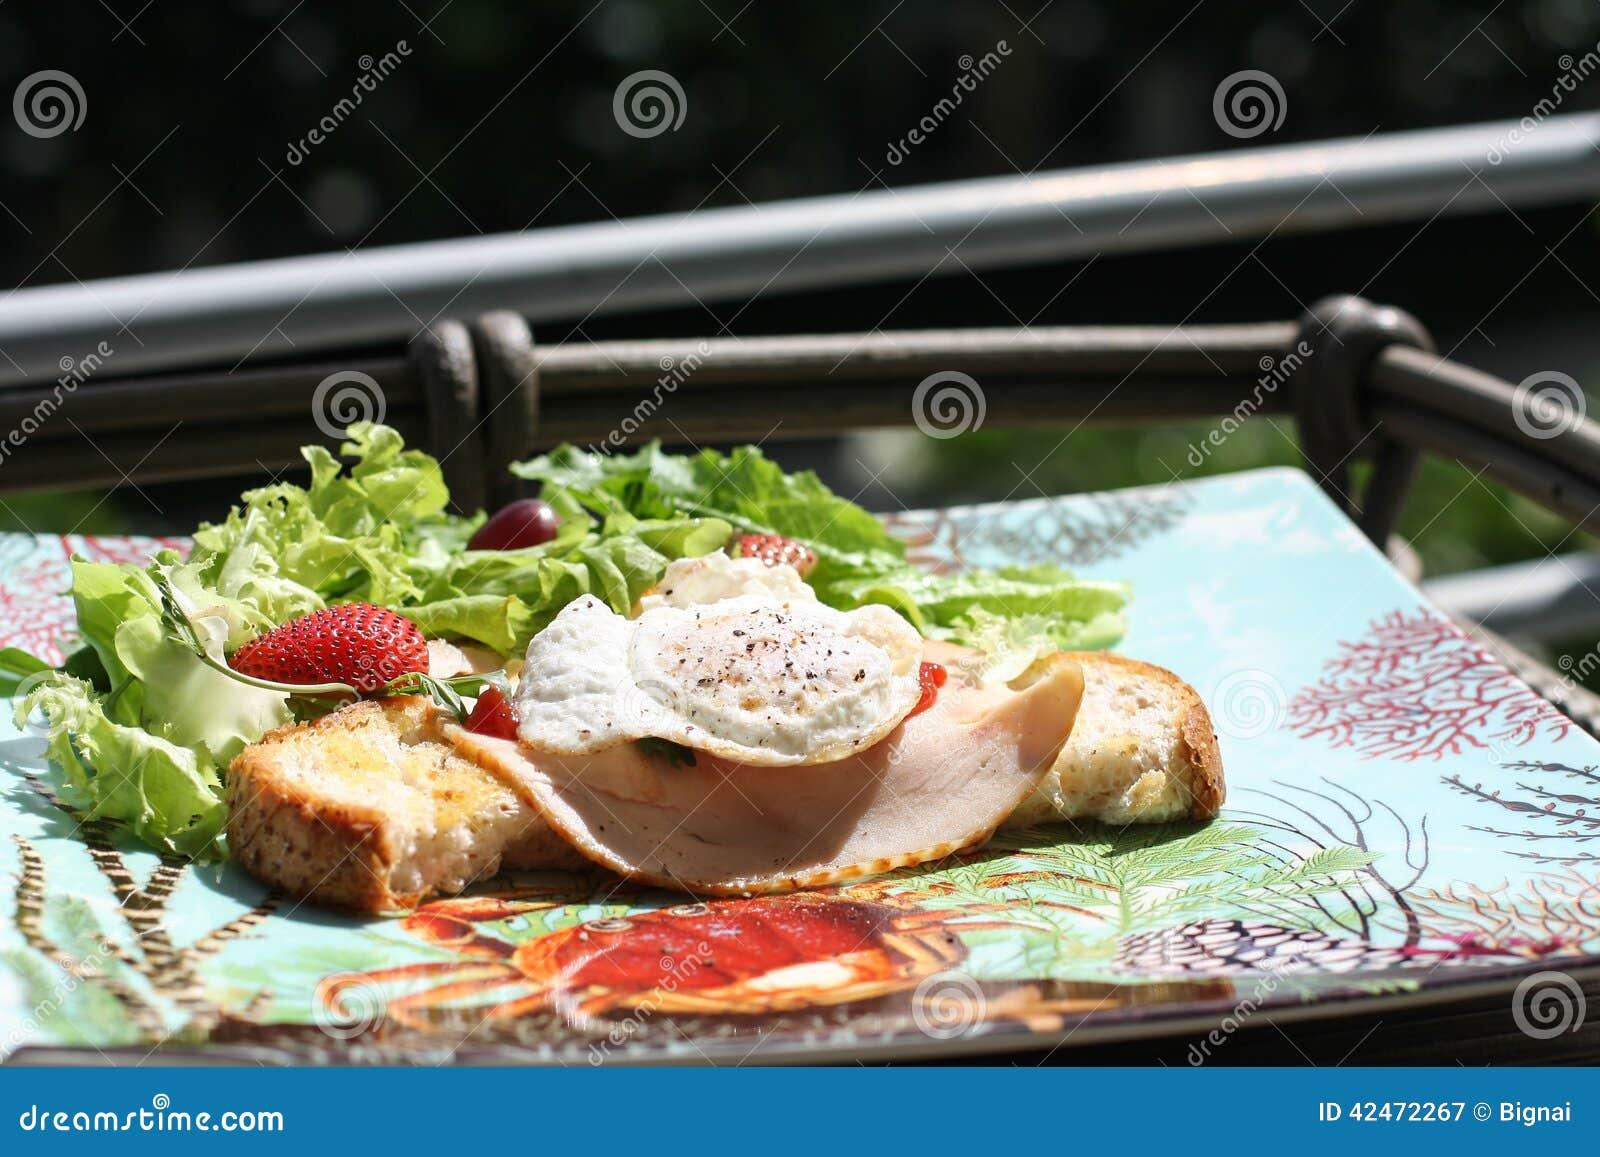 Frühstück mit Salaten